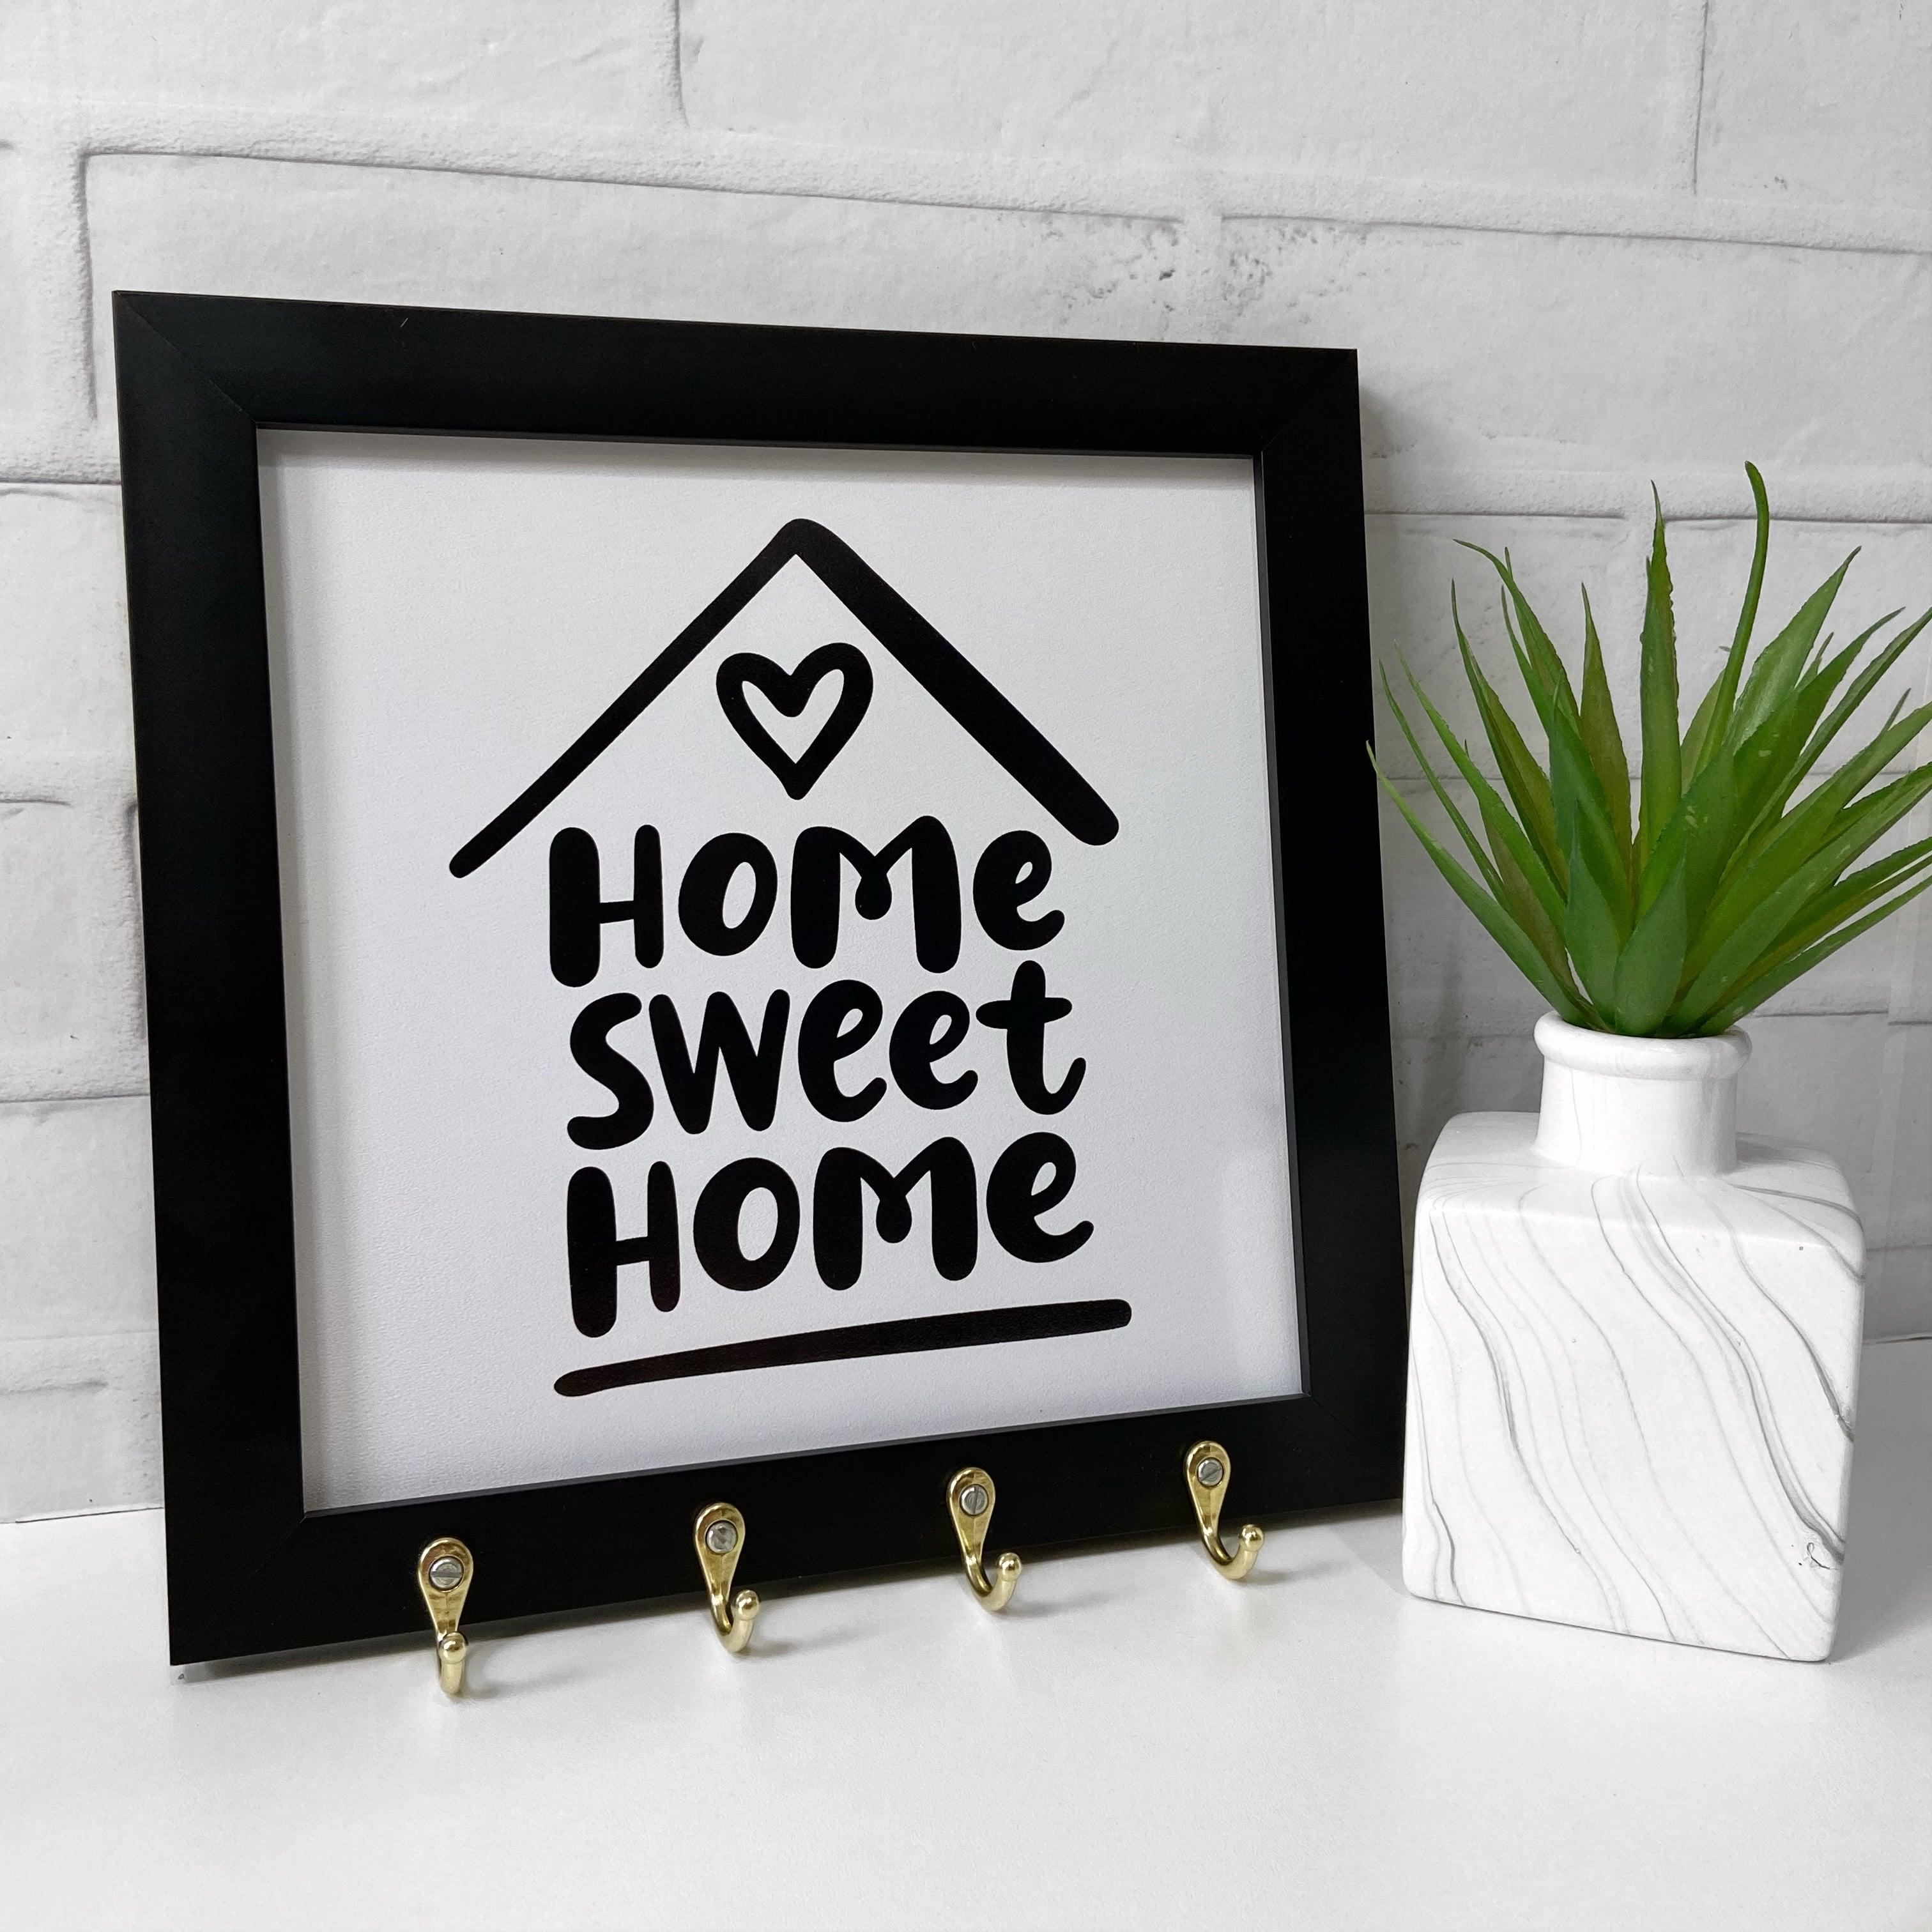 Quadro Porta Chaves - Home sweet home 2